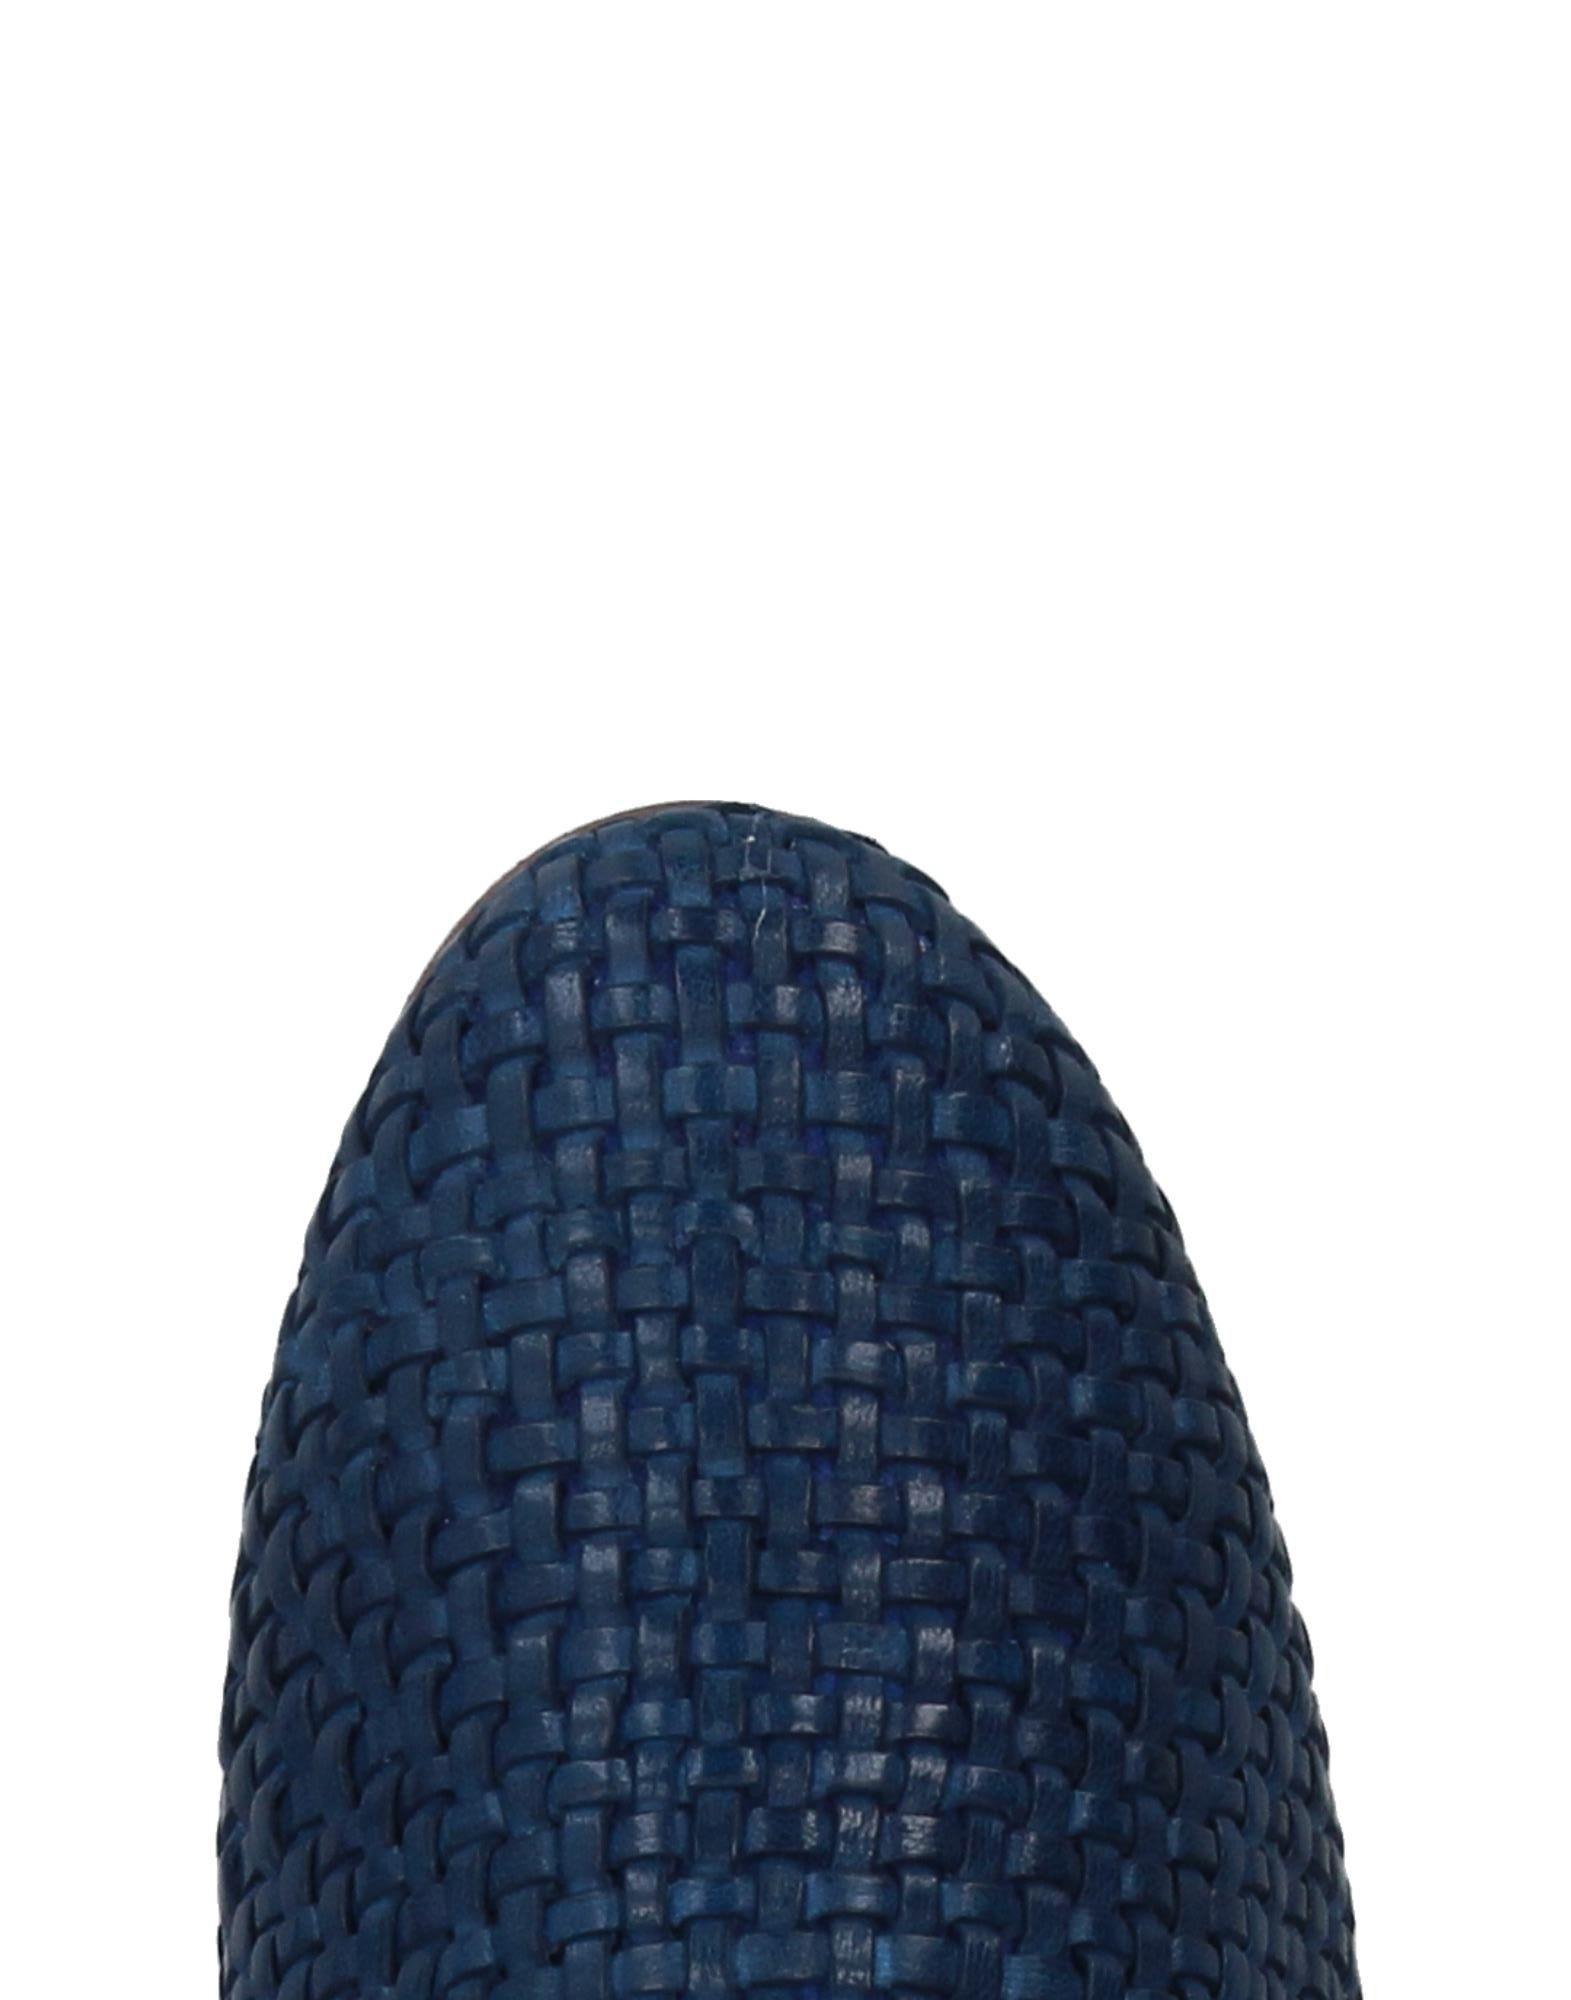 Fabi Schnürschuhe Damen  11415742TO Gute Qualität beliebte Schuhe